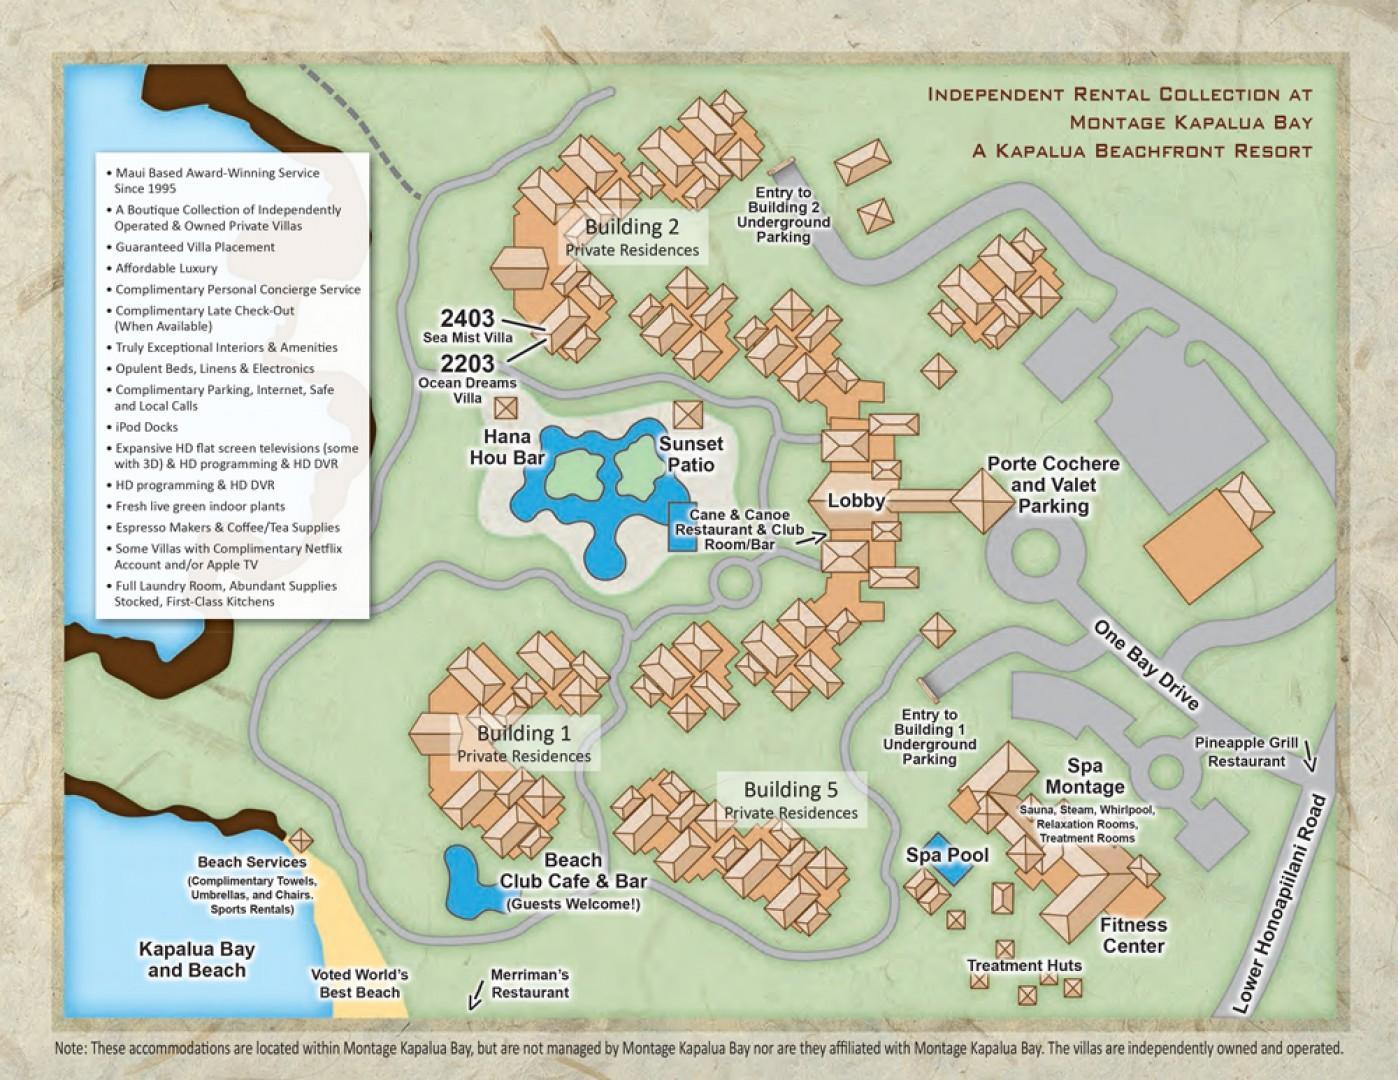 Montage Kapalua Bay Property Map